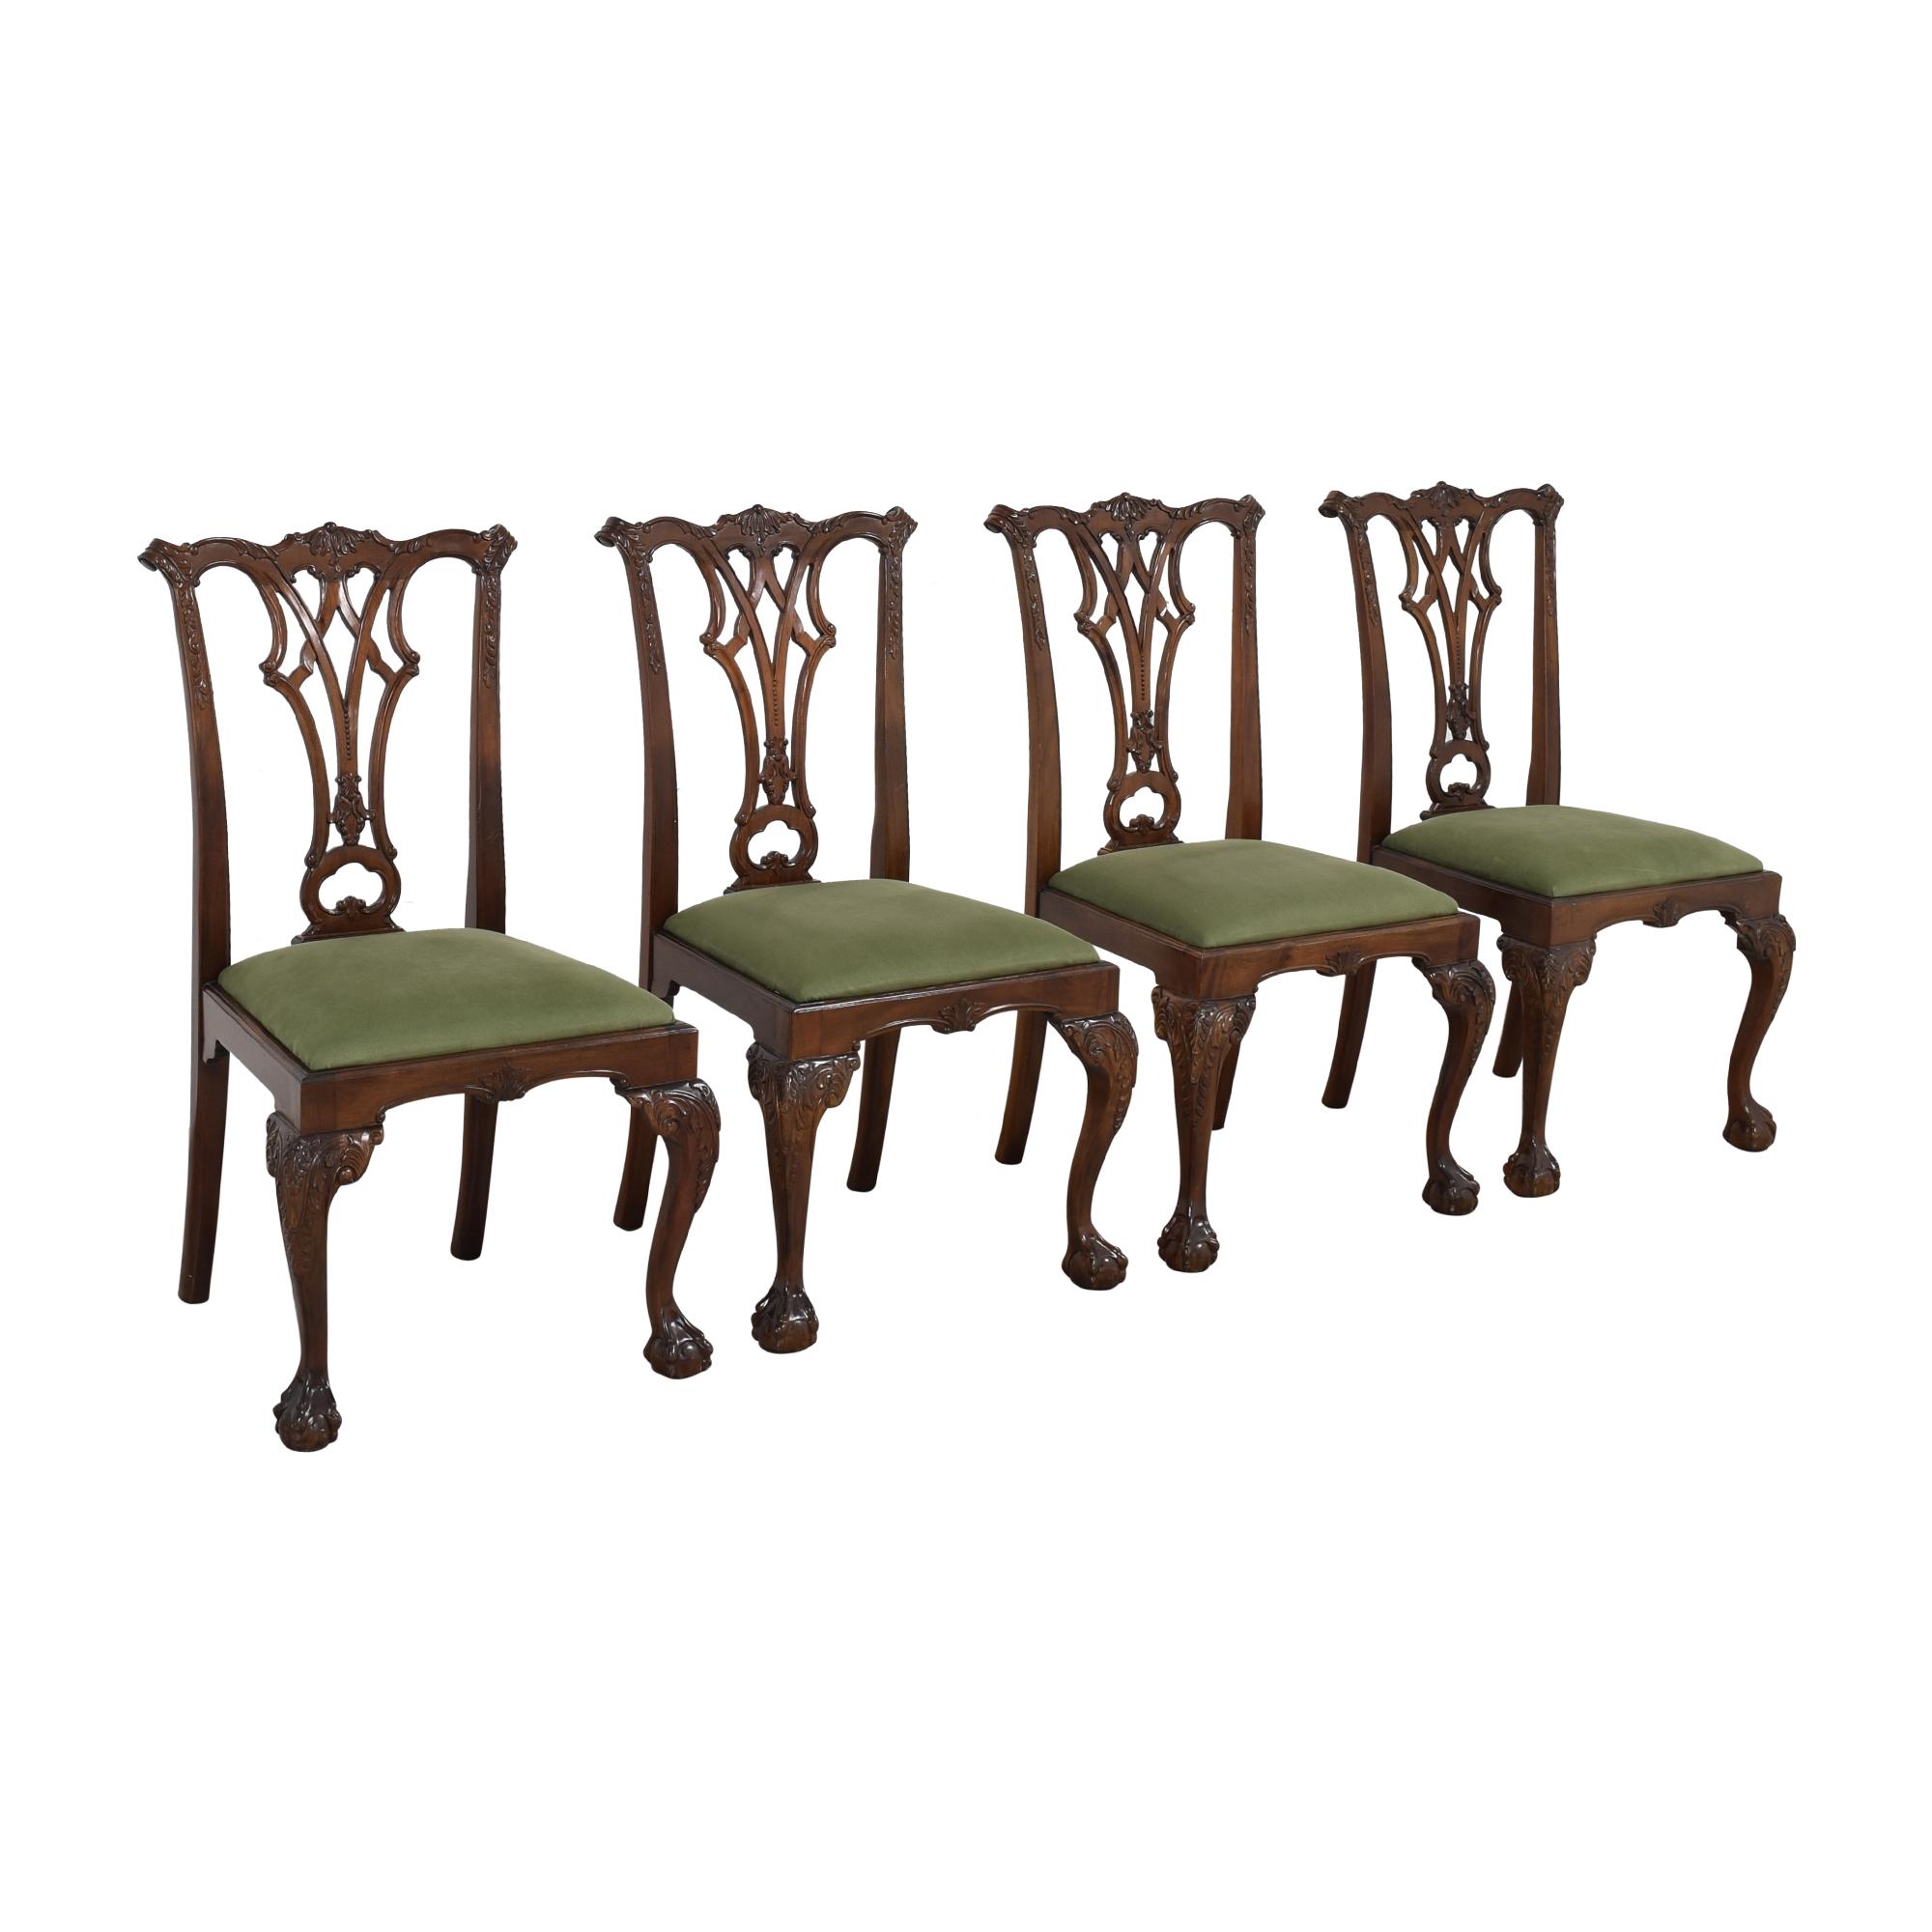 Greenbaum Interiors Vintage Upholstered Dining Chairs Greenbaum Interiors